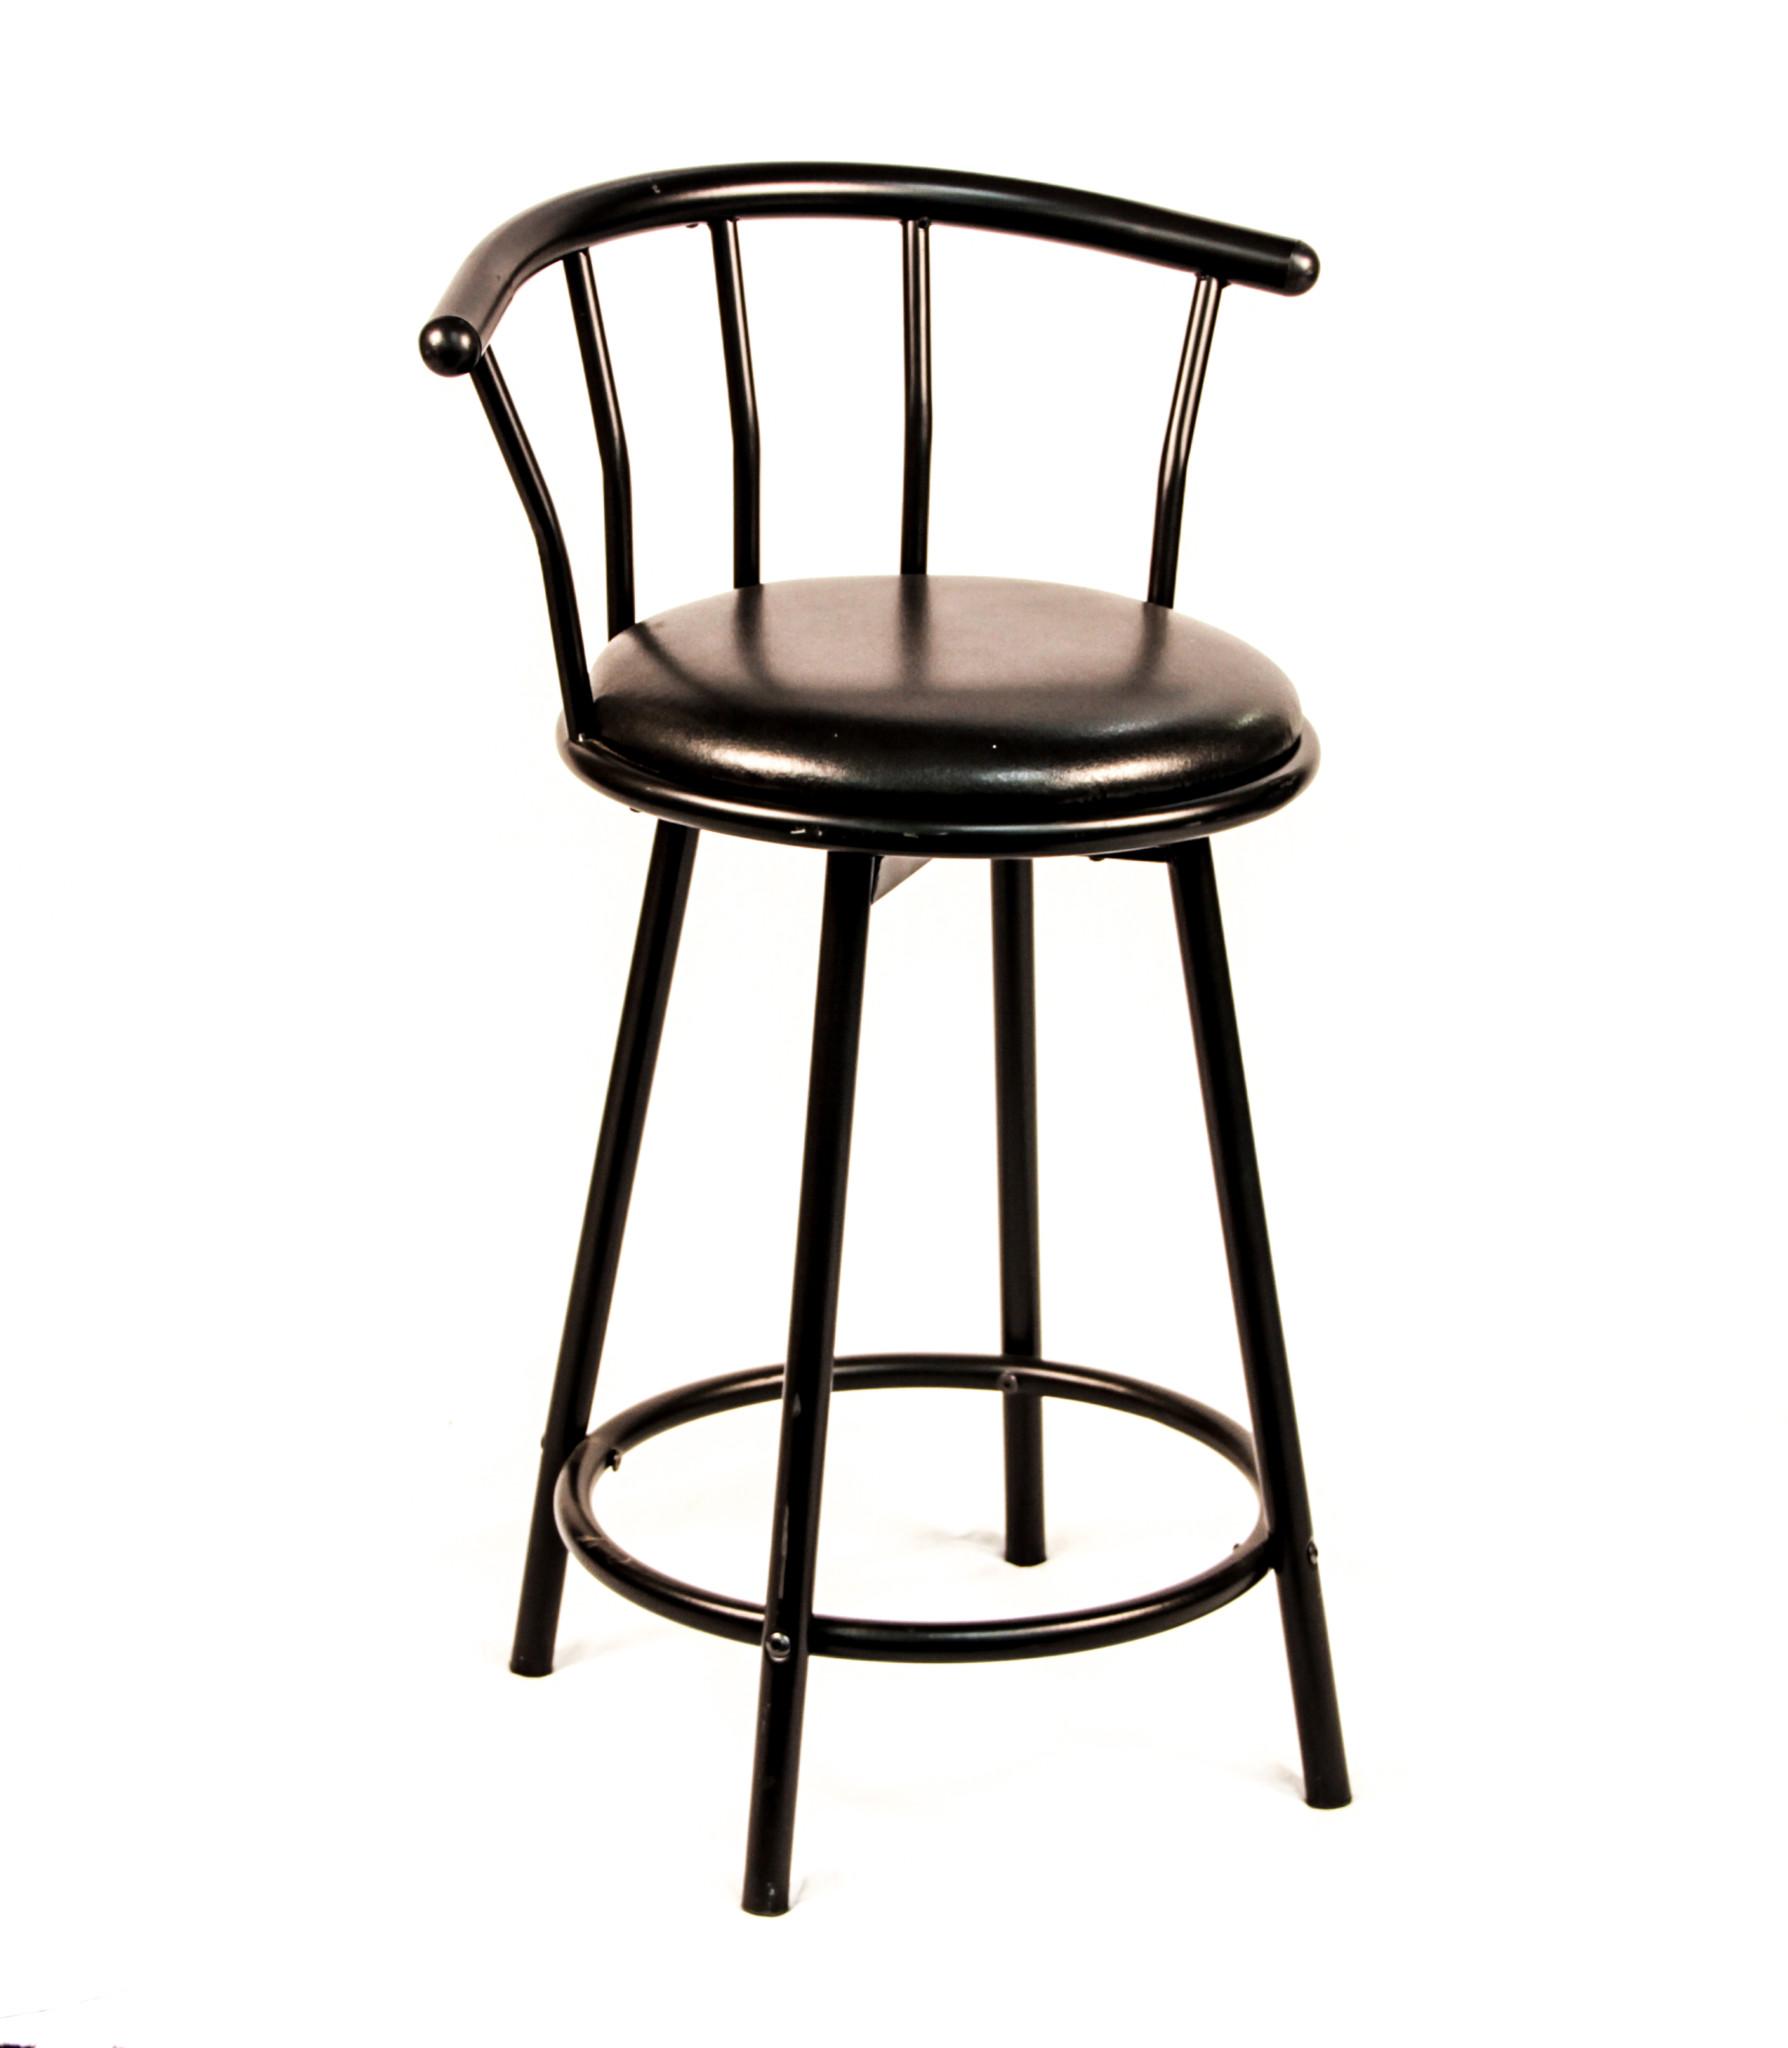 Admirable Spindle Back Bar Stool Black 24 Peter Corvallis Evergreenethics Interior Chair Design Evergreenethicsorg